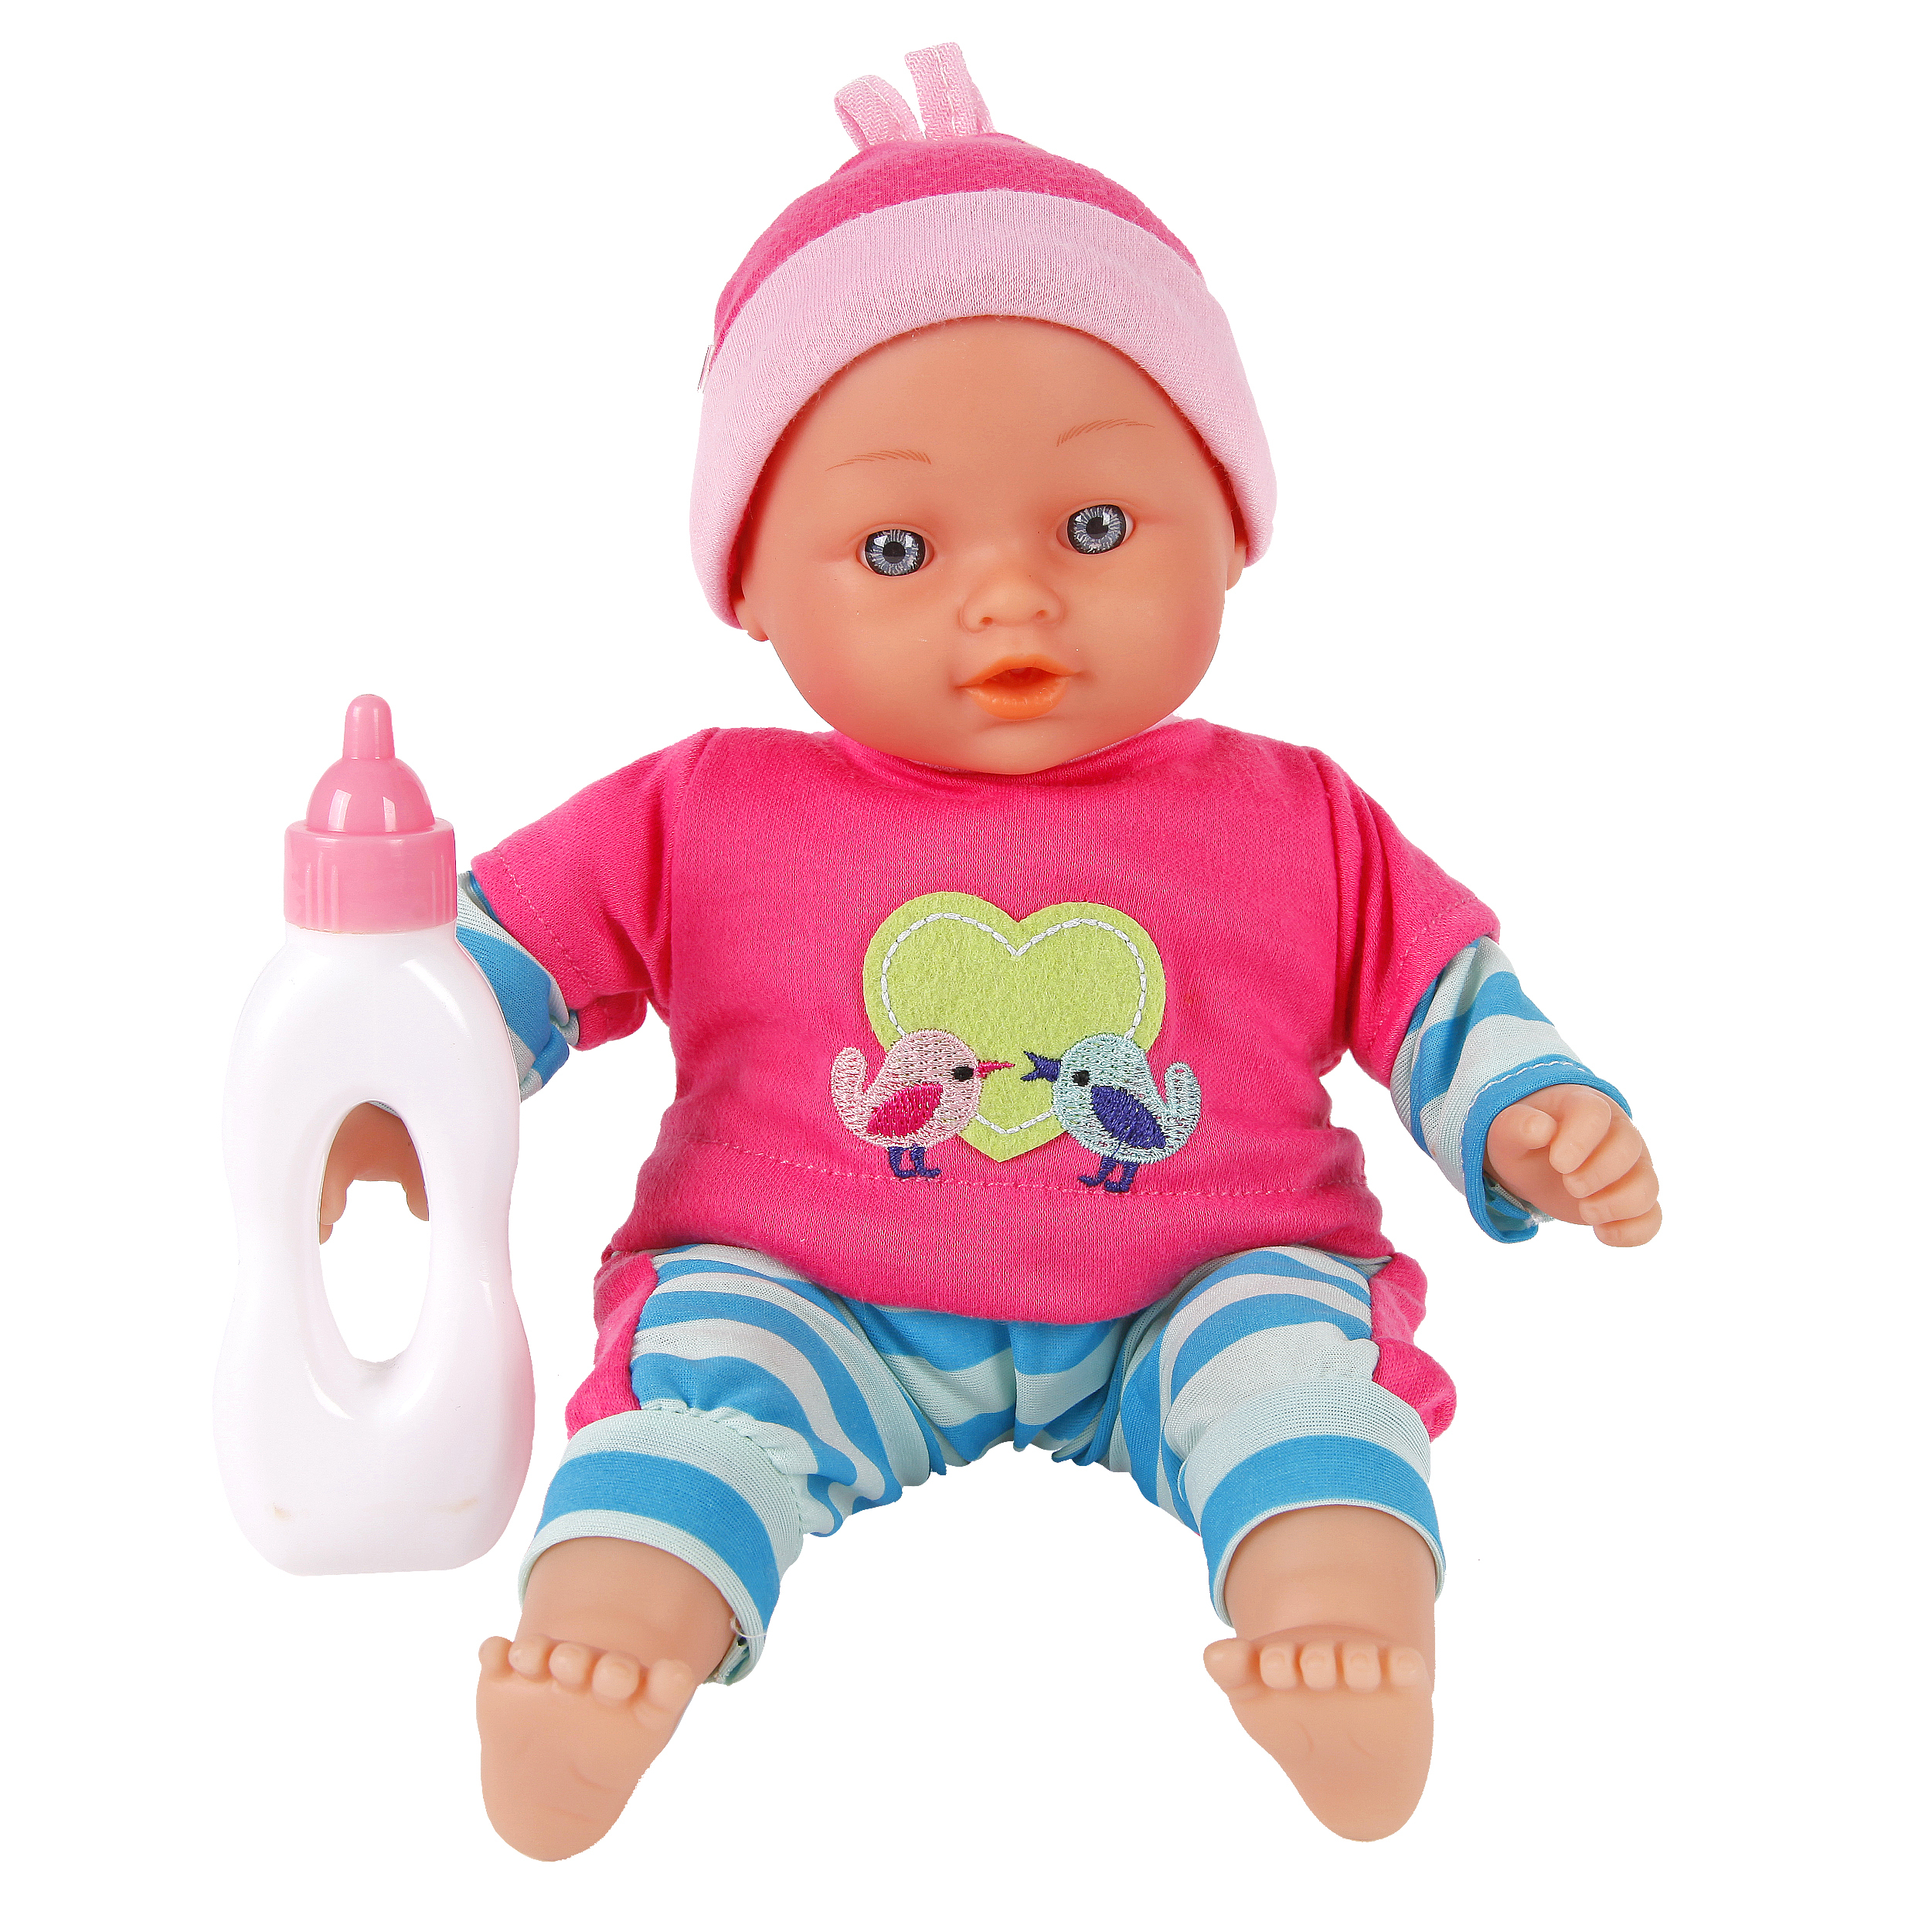 куклы и одежда для кукол mary poppins кукла маленькая плакса Кукла Mary Poppins Маленькая плакса